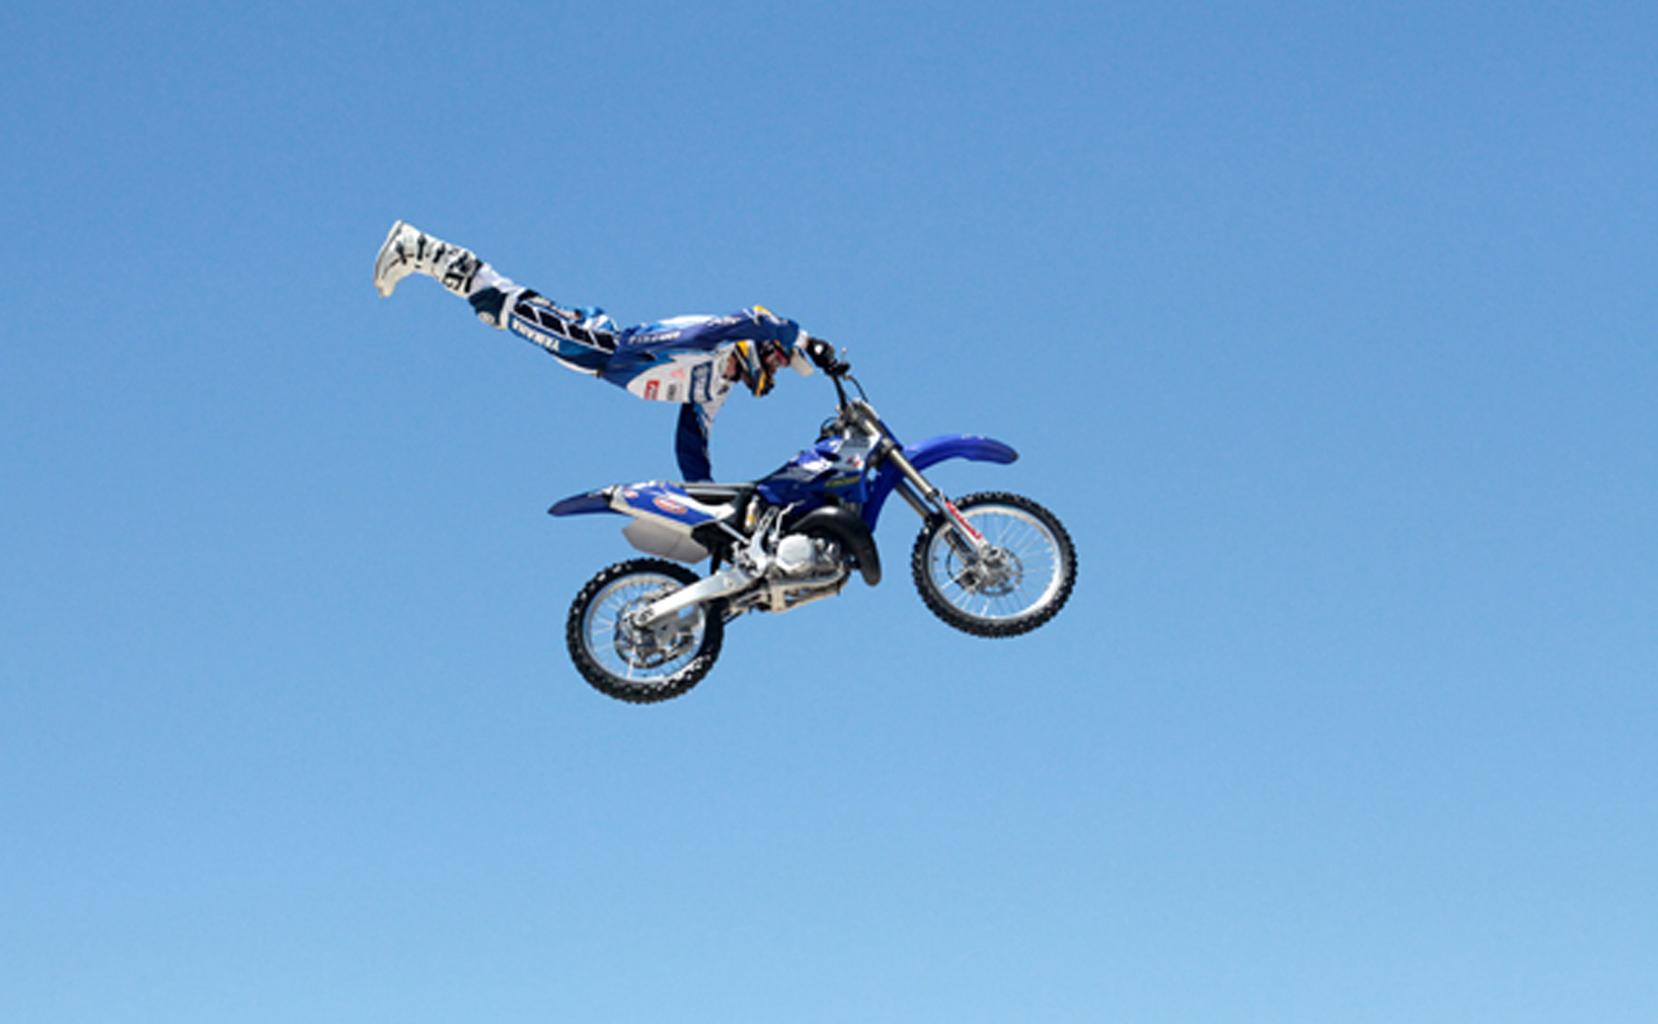 Jorge Negretti motocross